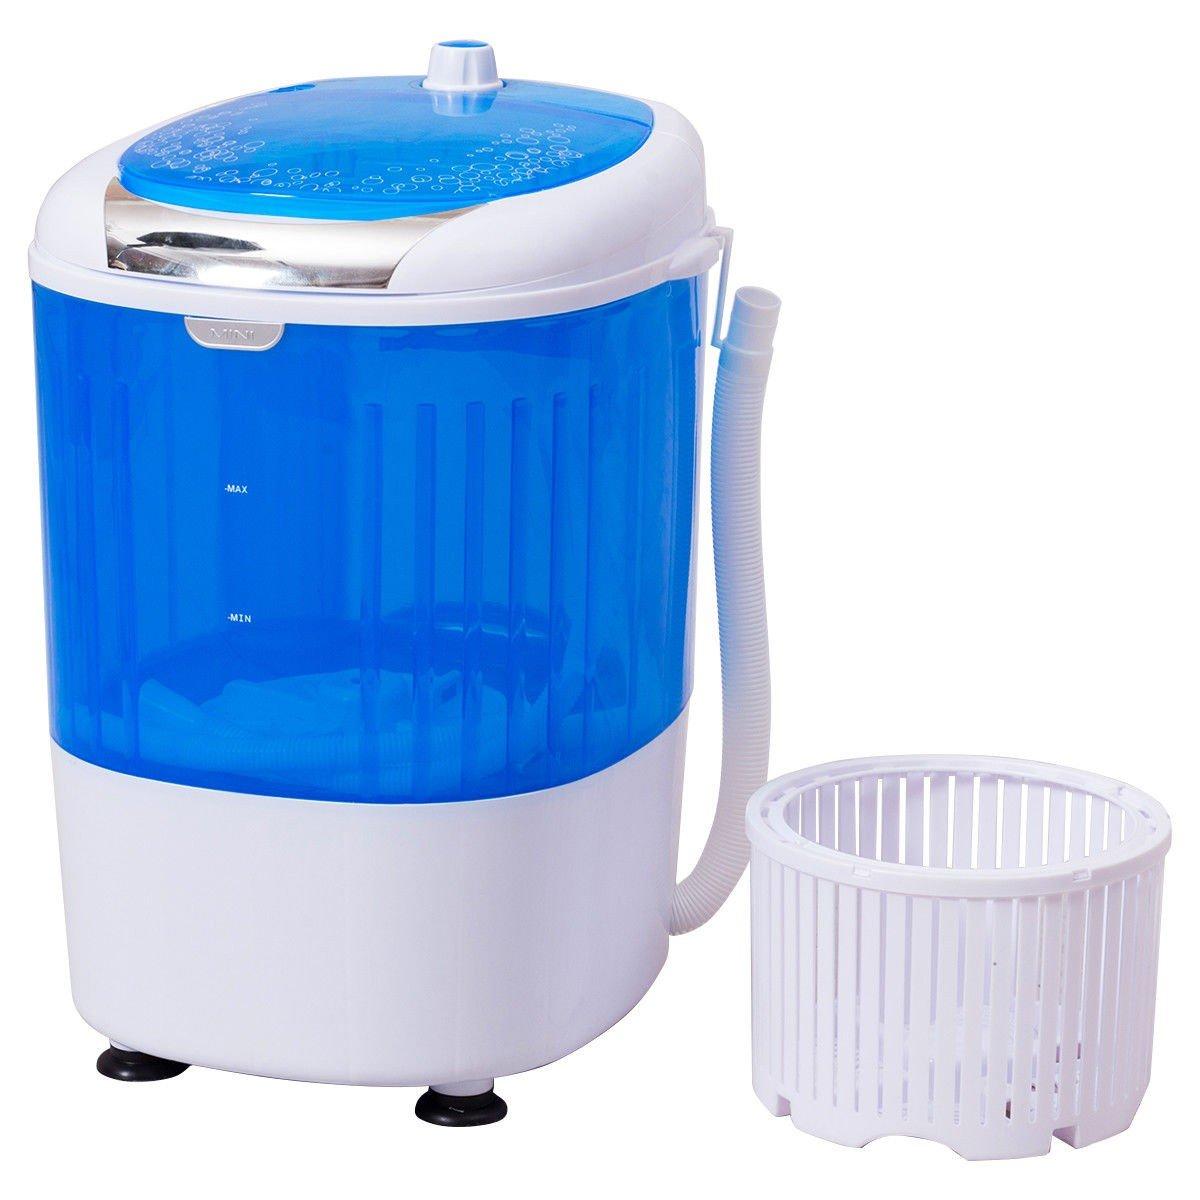 MD Group 5.5 lbs Portable Mini Semi Auto Washing Machine